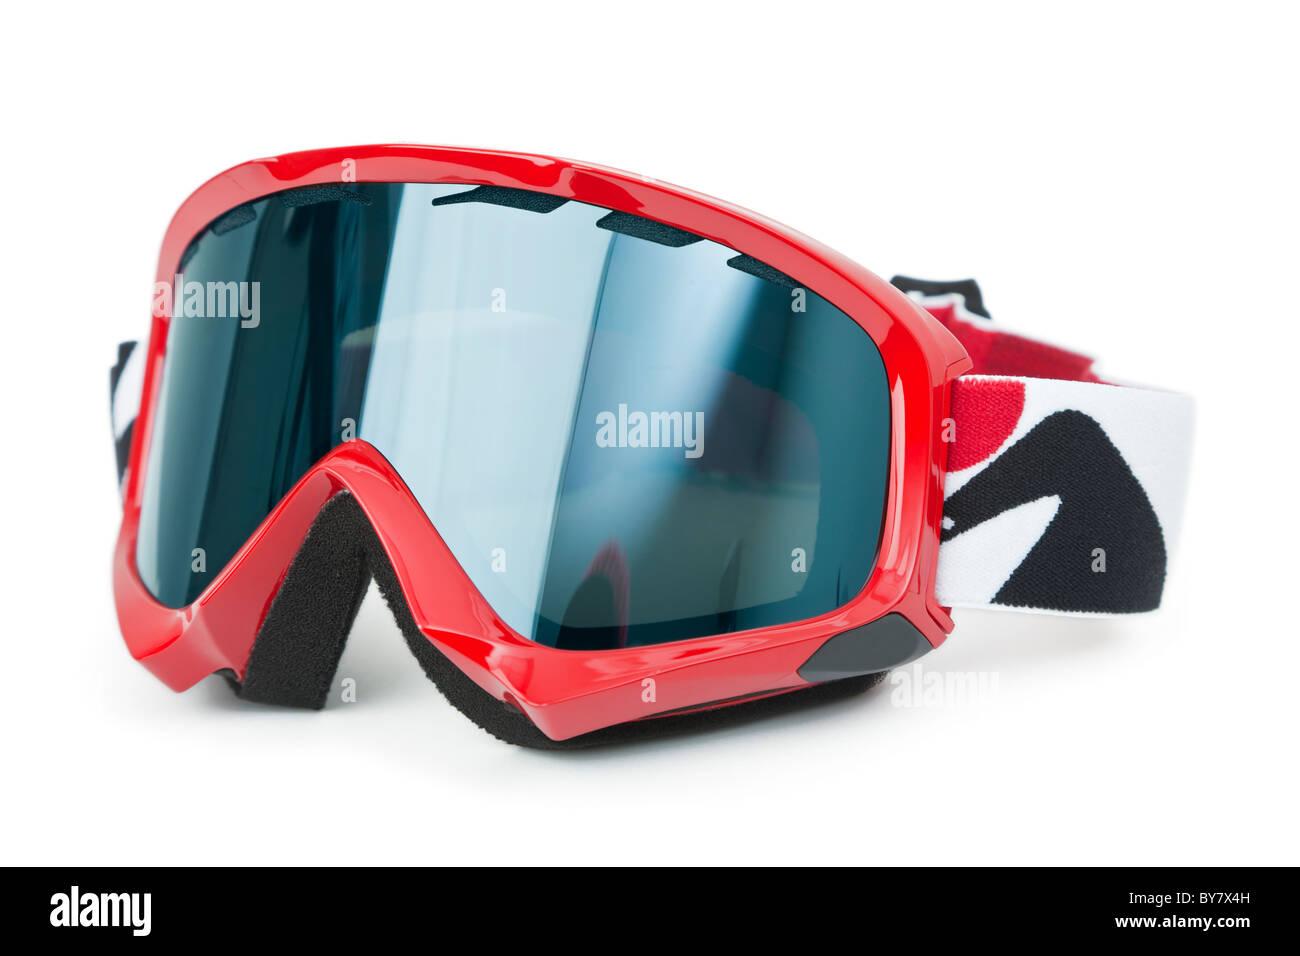 Brand new ski goggles isolated on white background - Stock Image